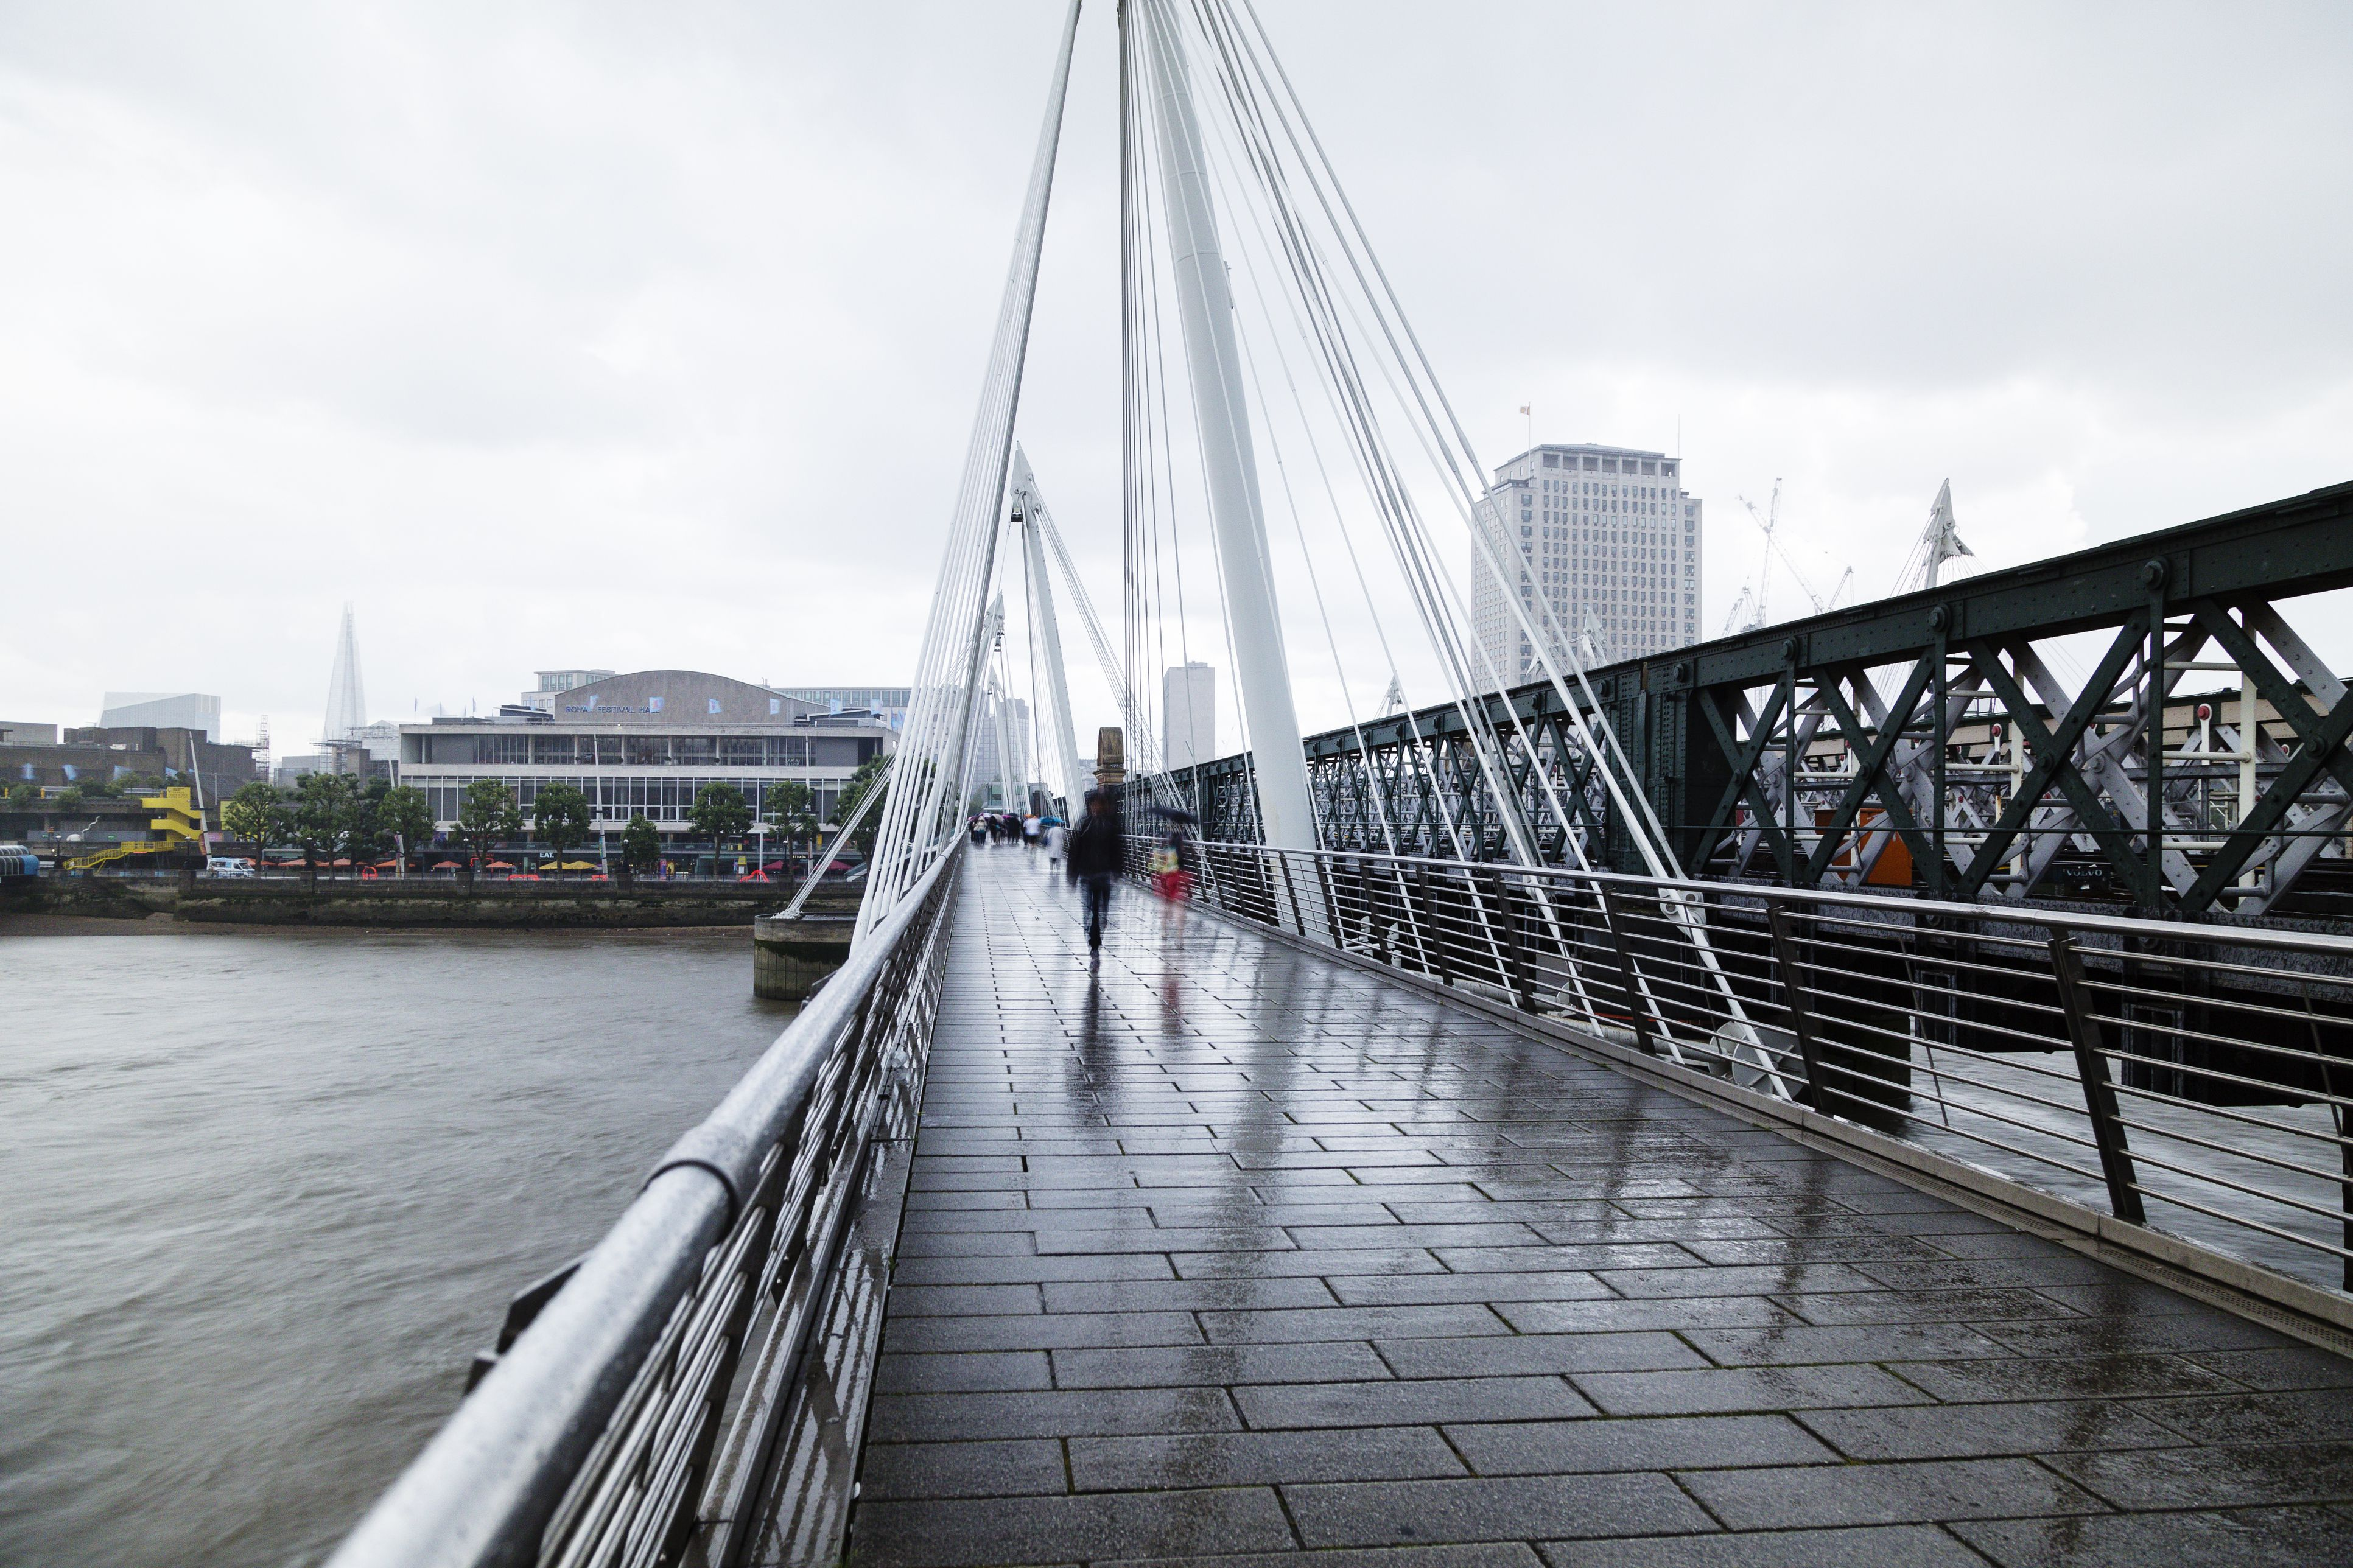 Golden Jubilee Bridge on a rainy day.